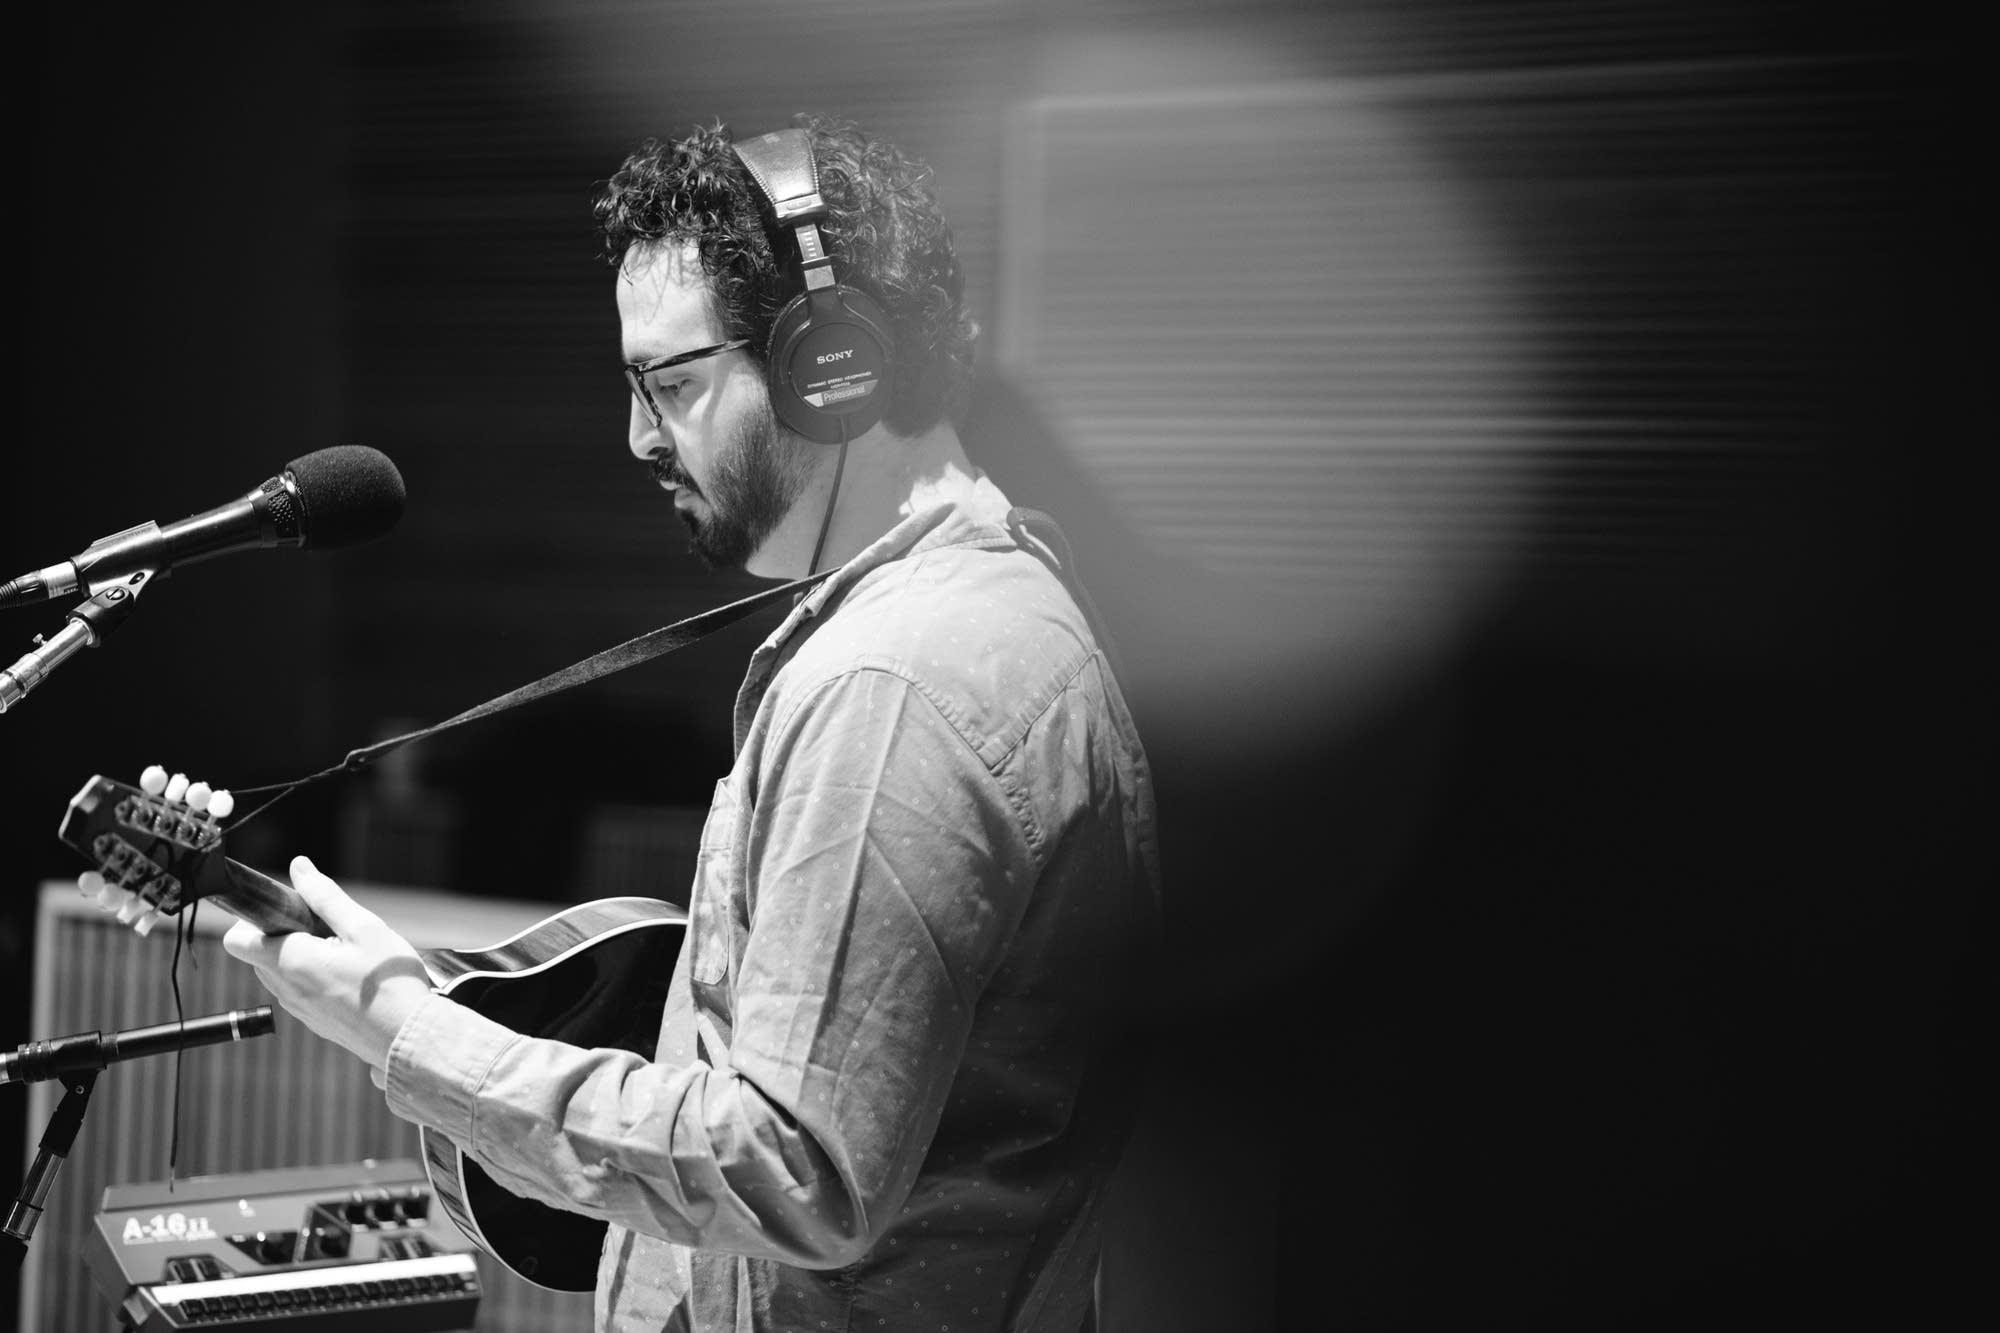 The Dustbowl Revival perform at Radio Heartland